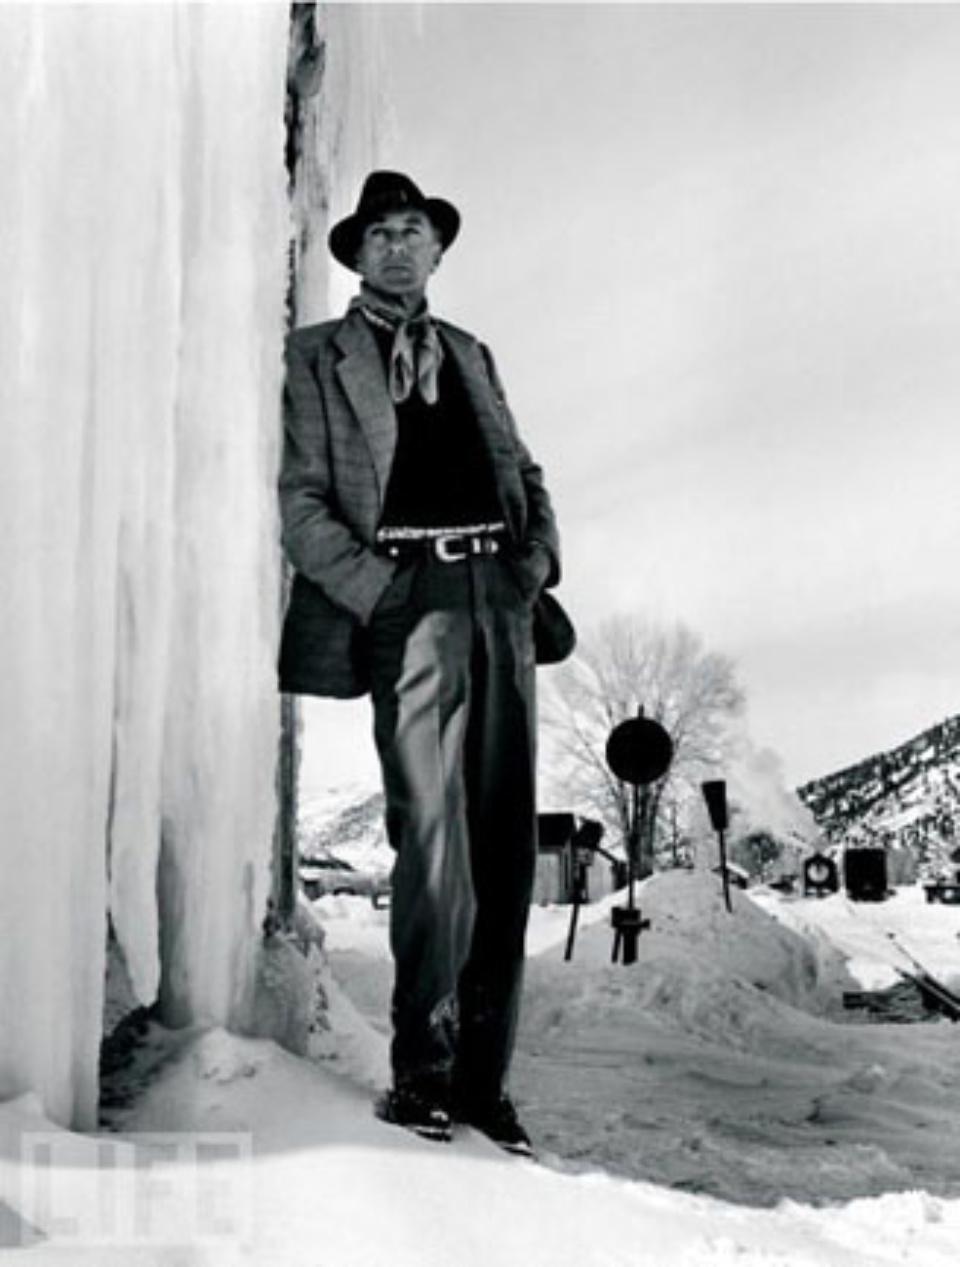 Peter Stockpole Gary Cooper, Aspen 1949 Gelatin silver print Ed. 250